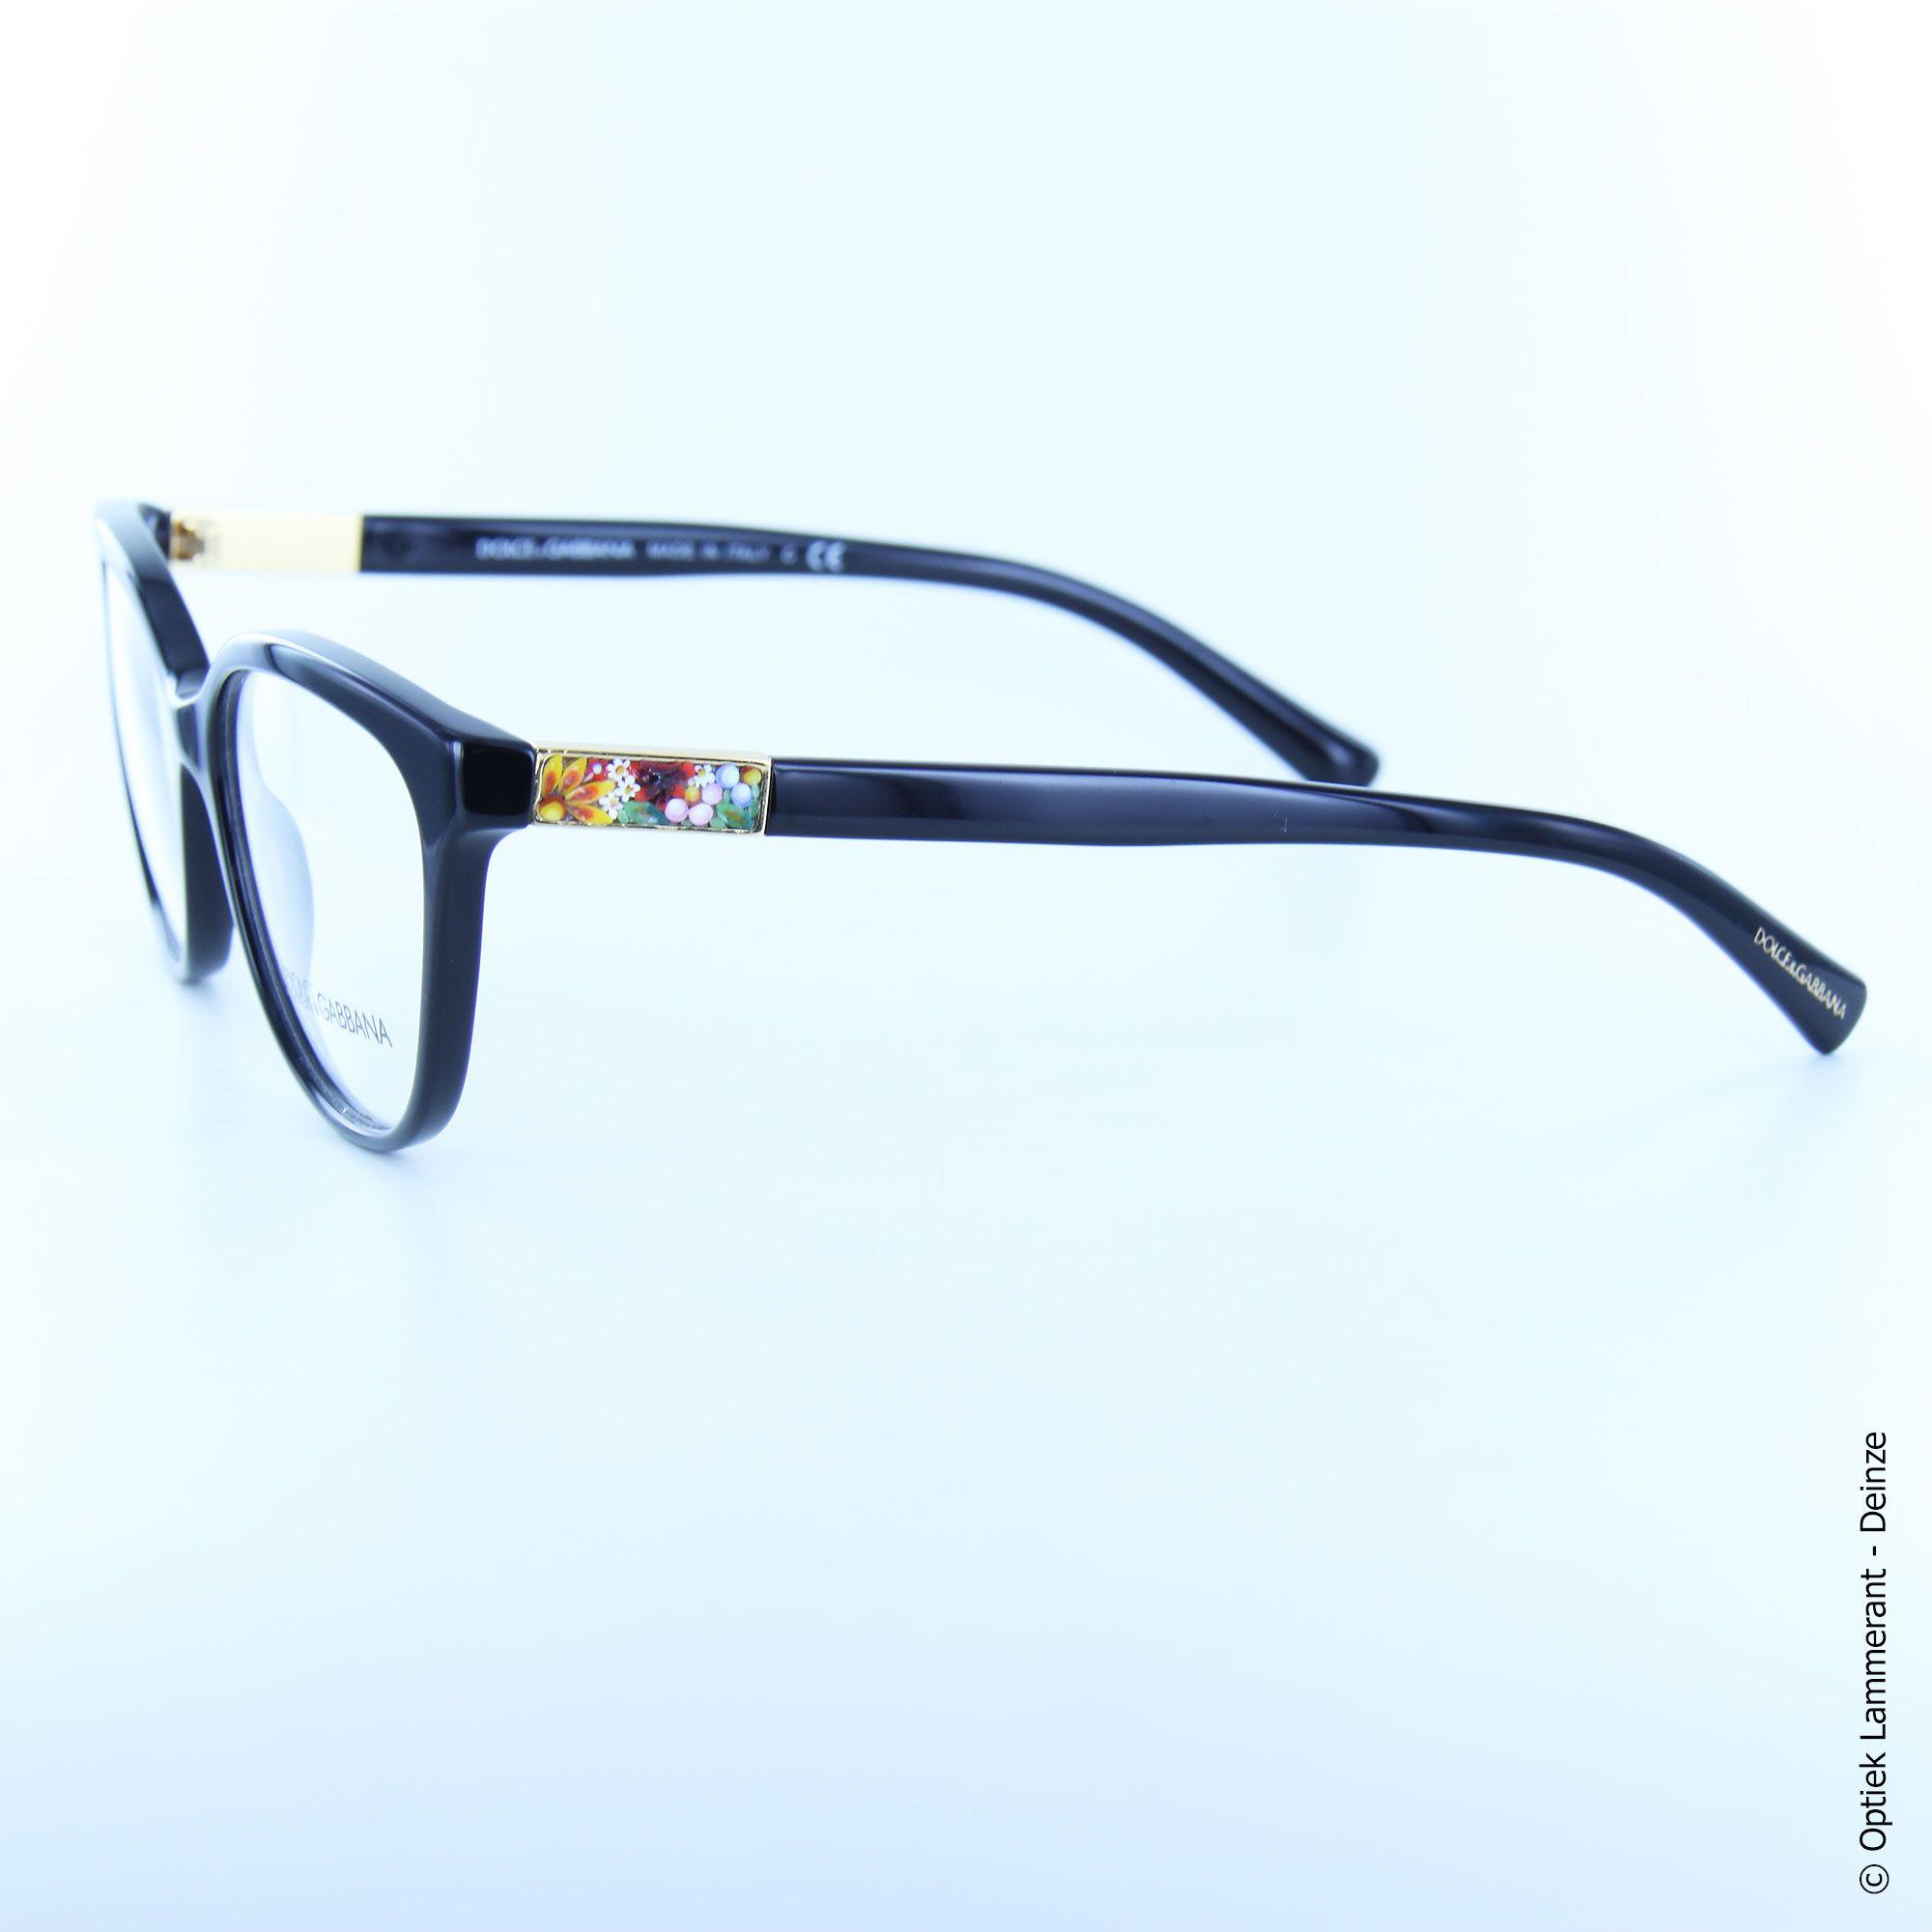 Dolce & Gabbana eyewear - glasses F/W '14/'15